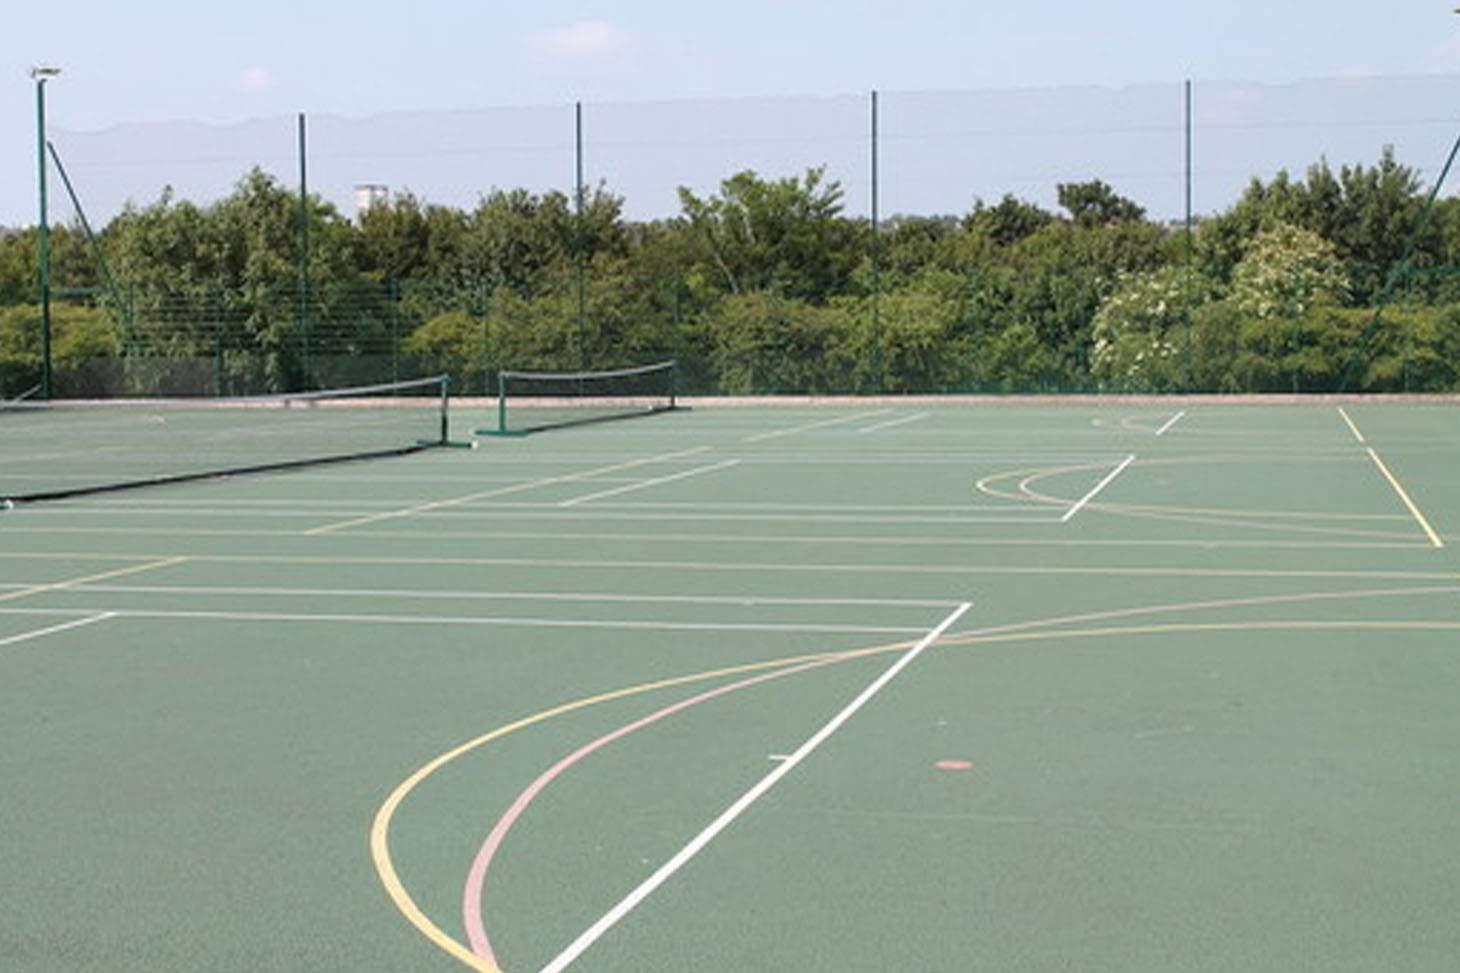 Kingsmeadow Community School 5 a side | Hard (macadam) football pitch